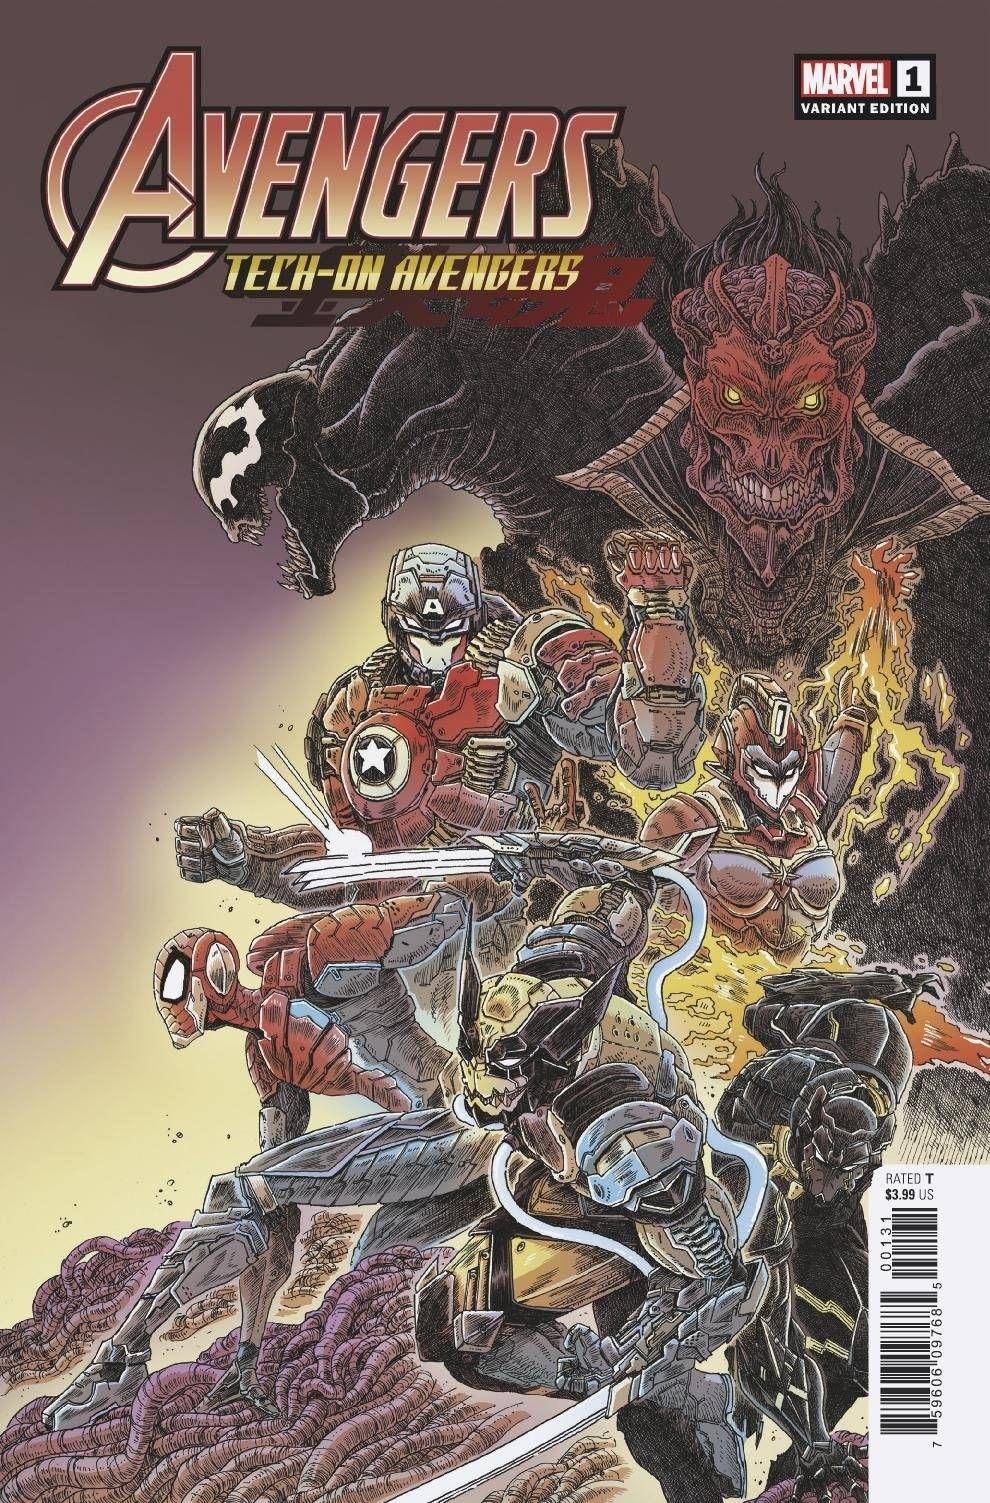 eyJidWNrZXQiOiJnb2NvbGxlY3QuaW1hZ2VzLnB1YiIsImtleSI6IjQwMzc0ZWMxLWQ0NDgtNGQzZS1hOWE3LTgxZDgzNTNiYTlkMS5qcGciLCJlZGl0cyI6W119 ComicList: Marvel Comics New Releases for 08/11/2021